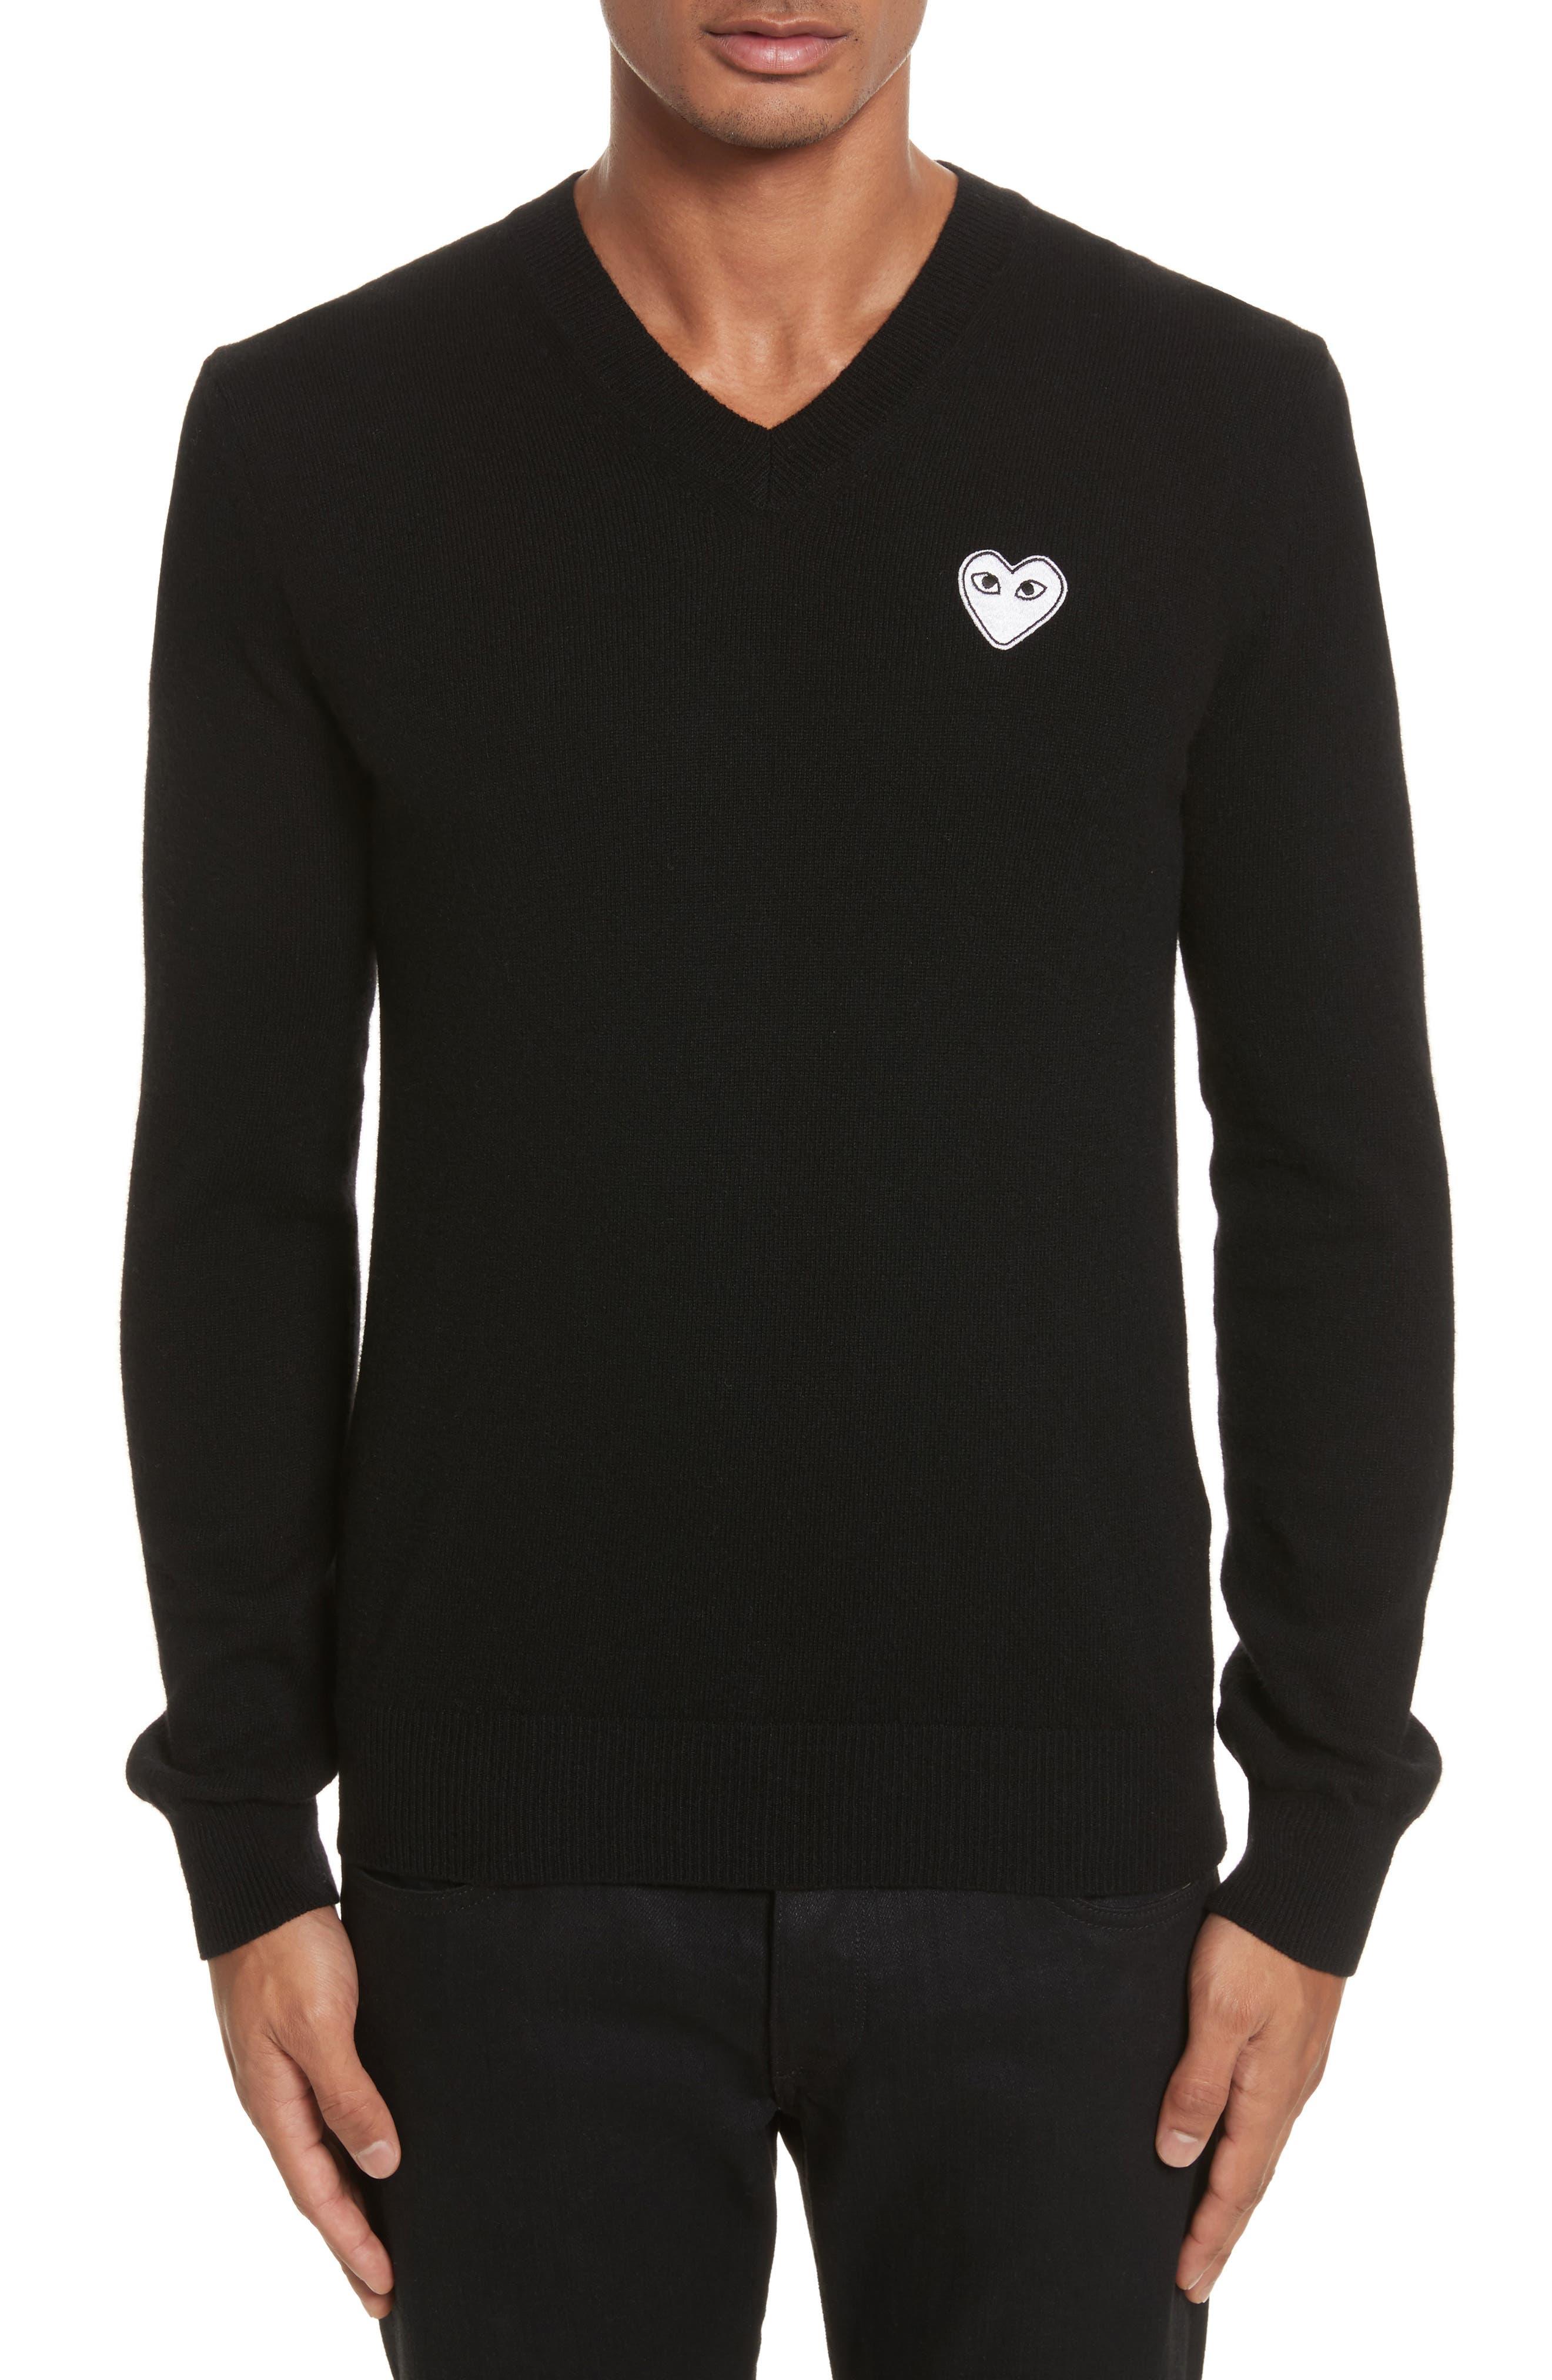 White Heart Wool V-Neck Sweater,                             Main thumbnail 1, color,                             BLACK